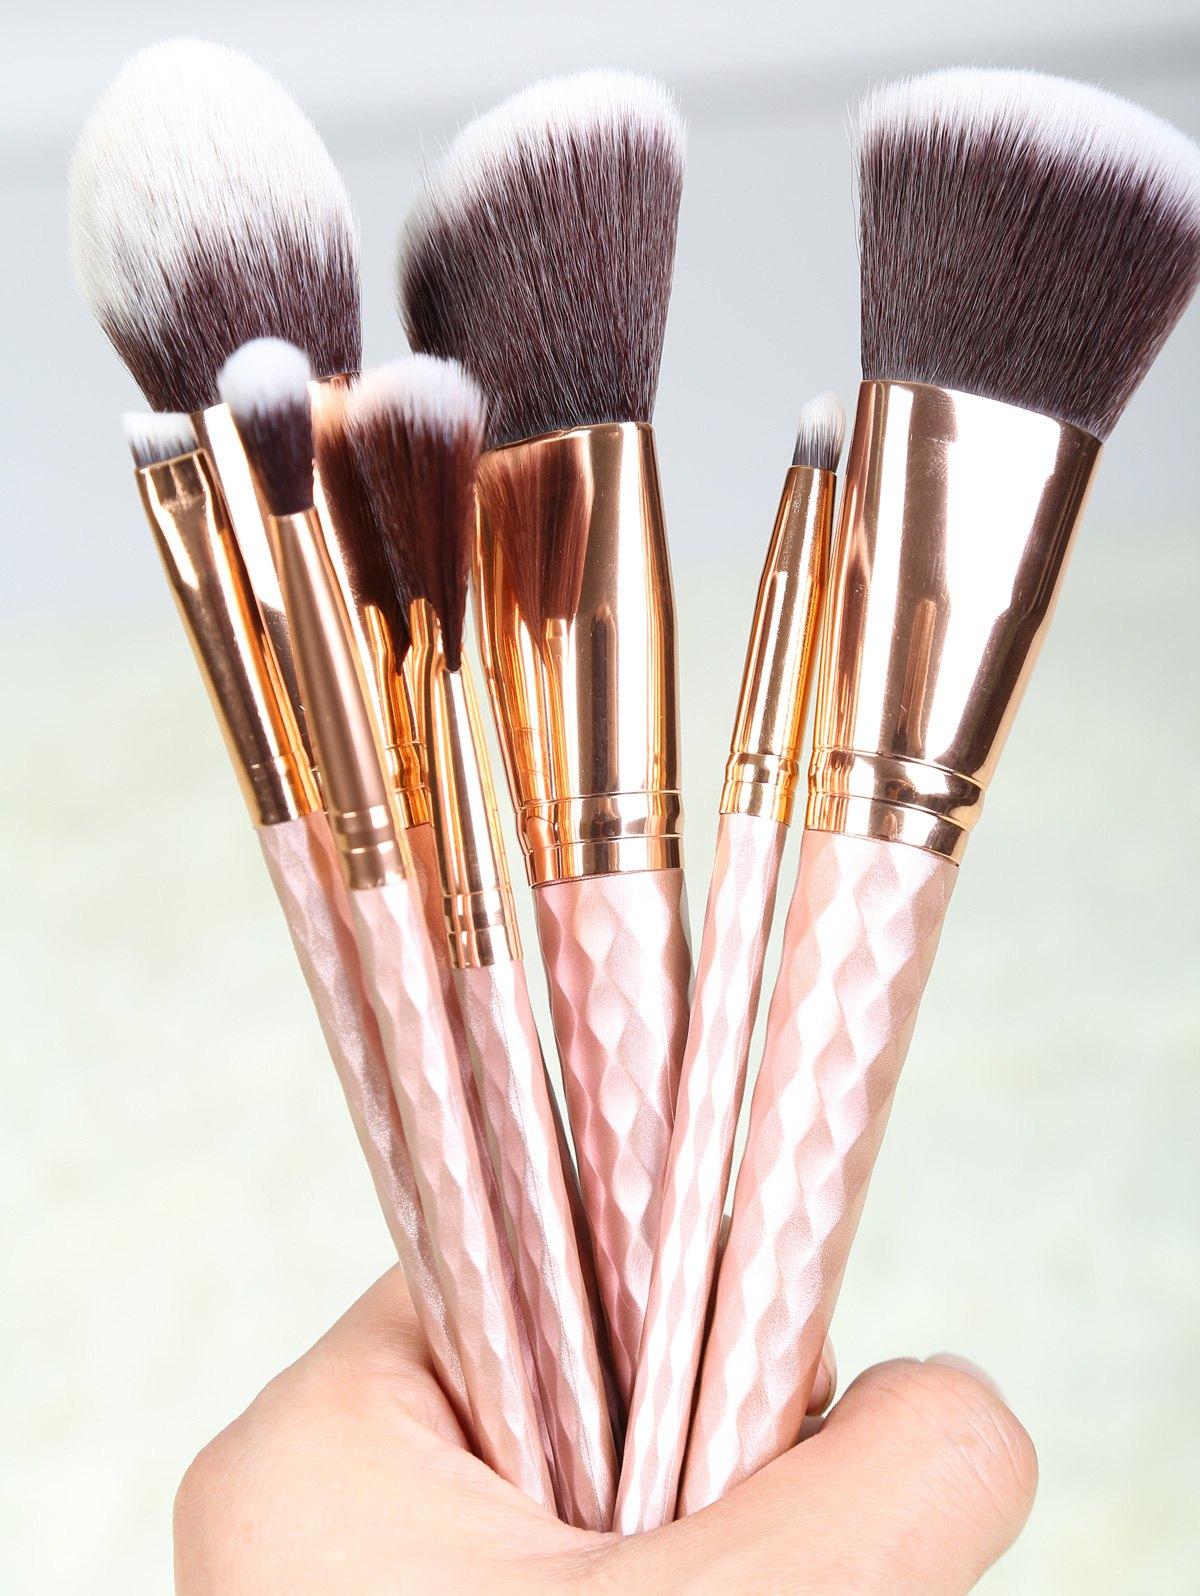 8 Pcs Rhombus Handle Fiber Makeup Brushes Set